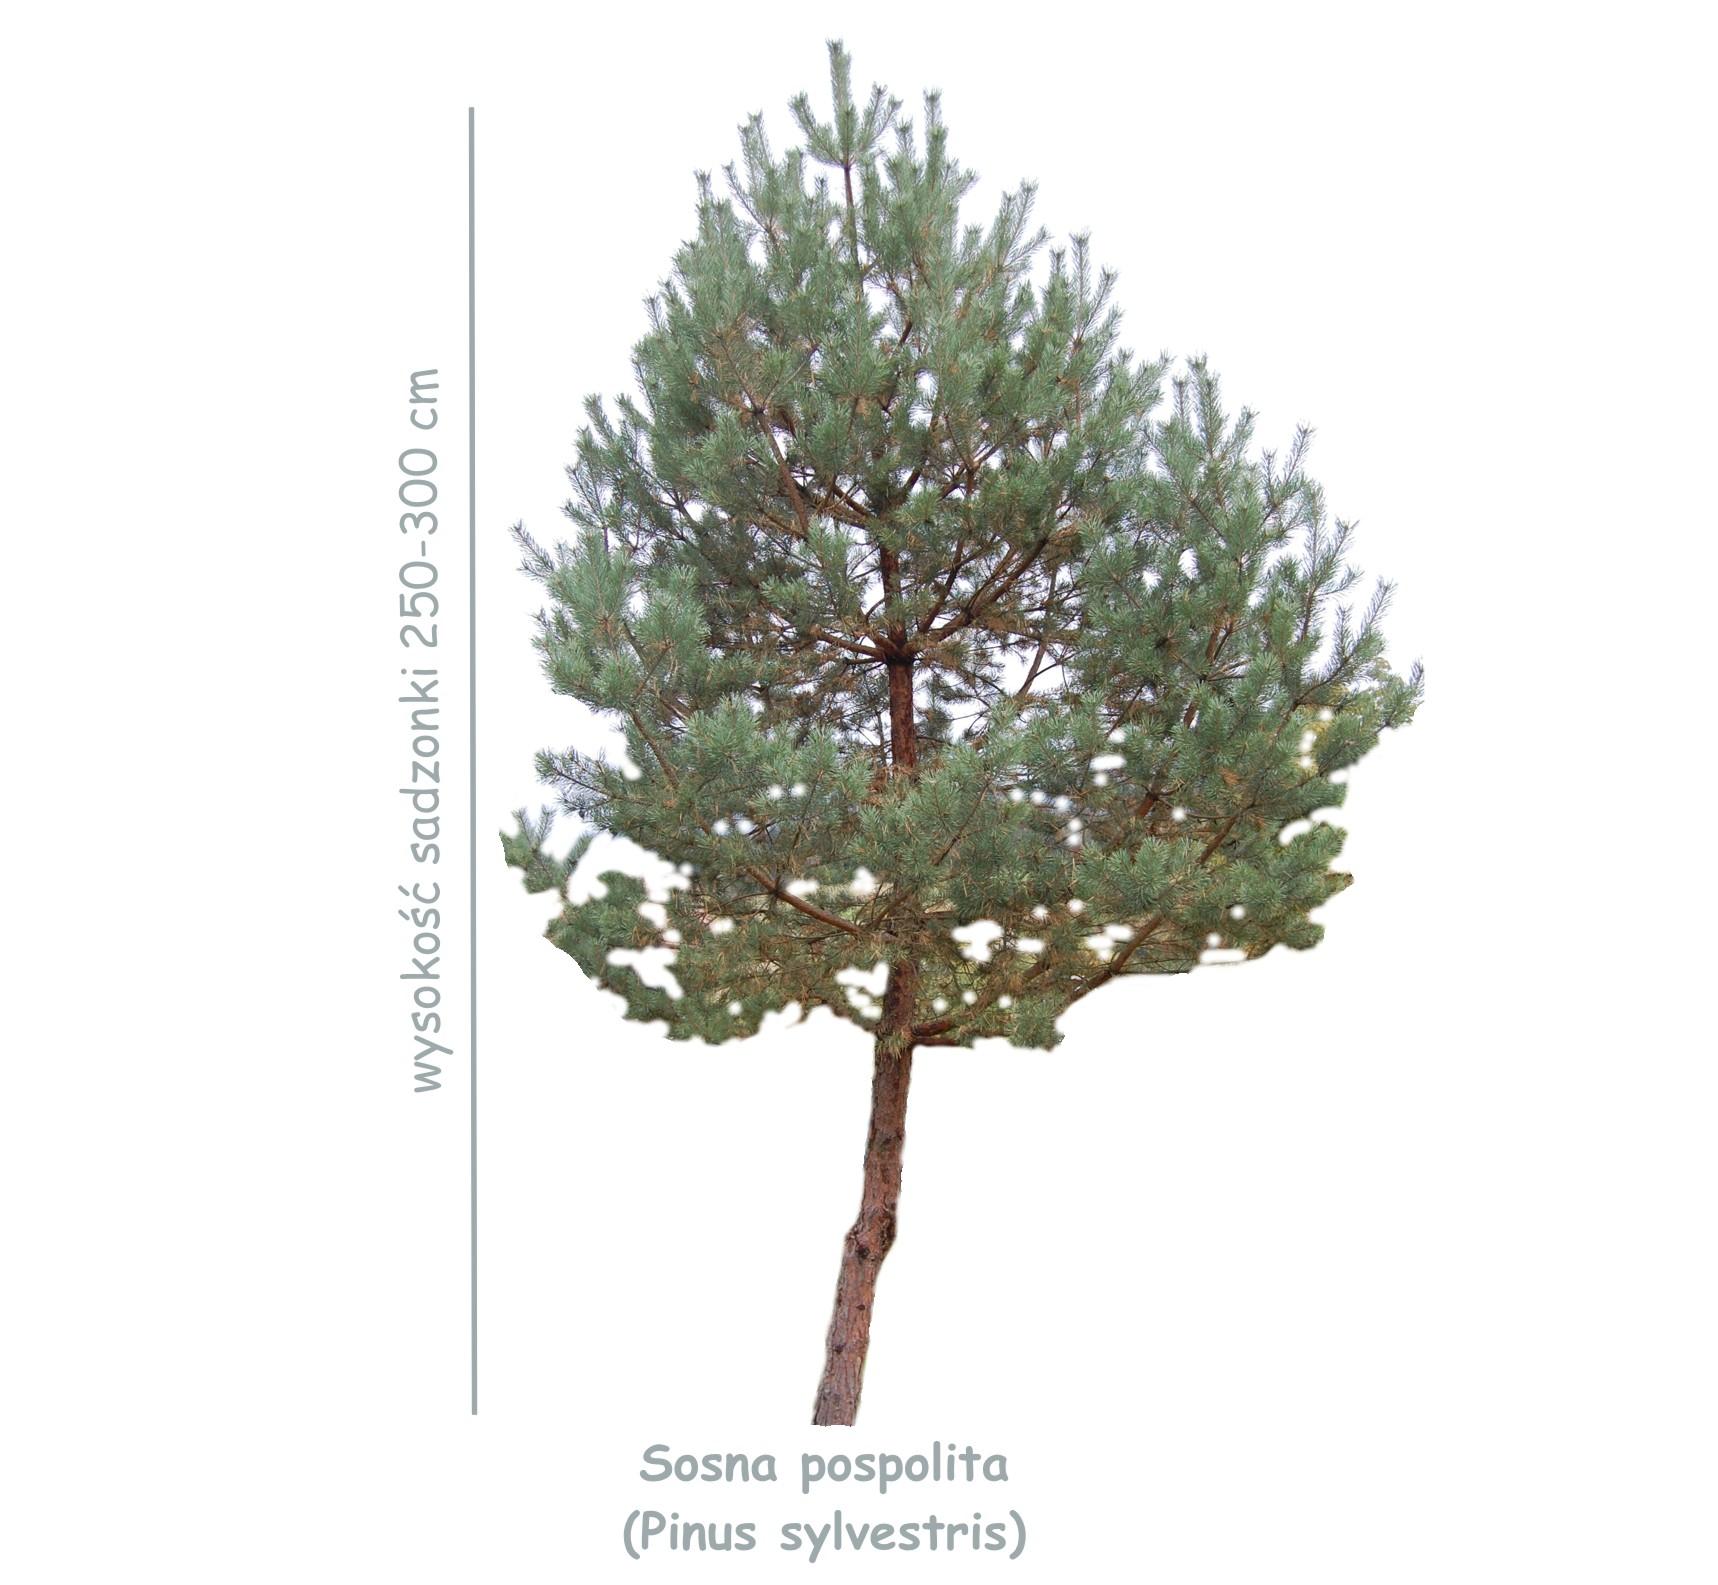 Sosna pospolita (Pinus sylvestris) sadzonka o wysokości 250-300 cm